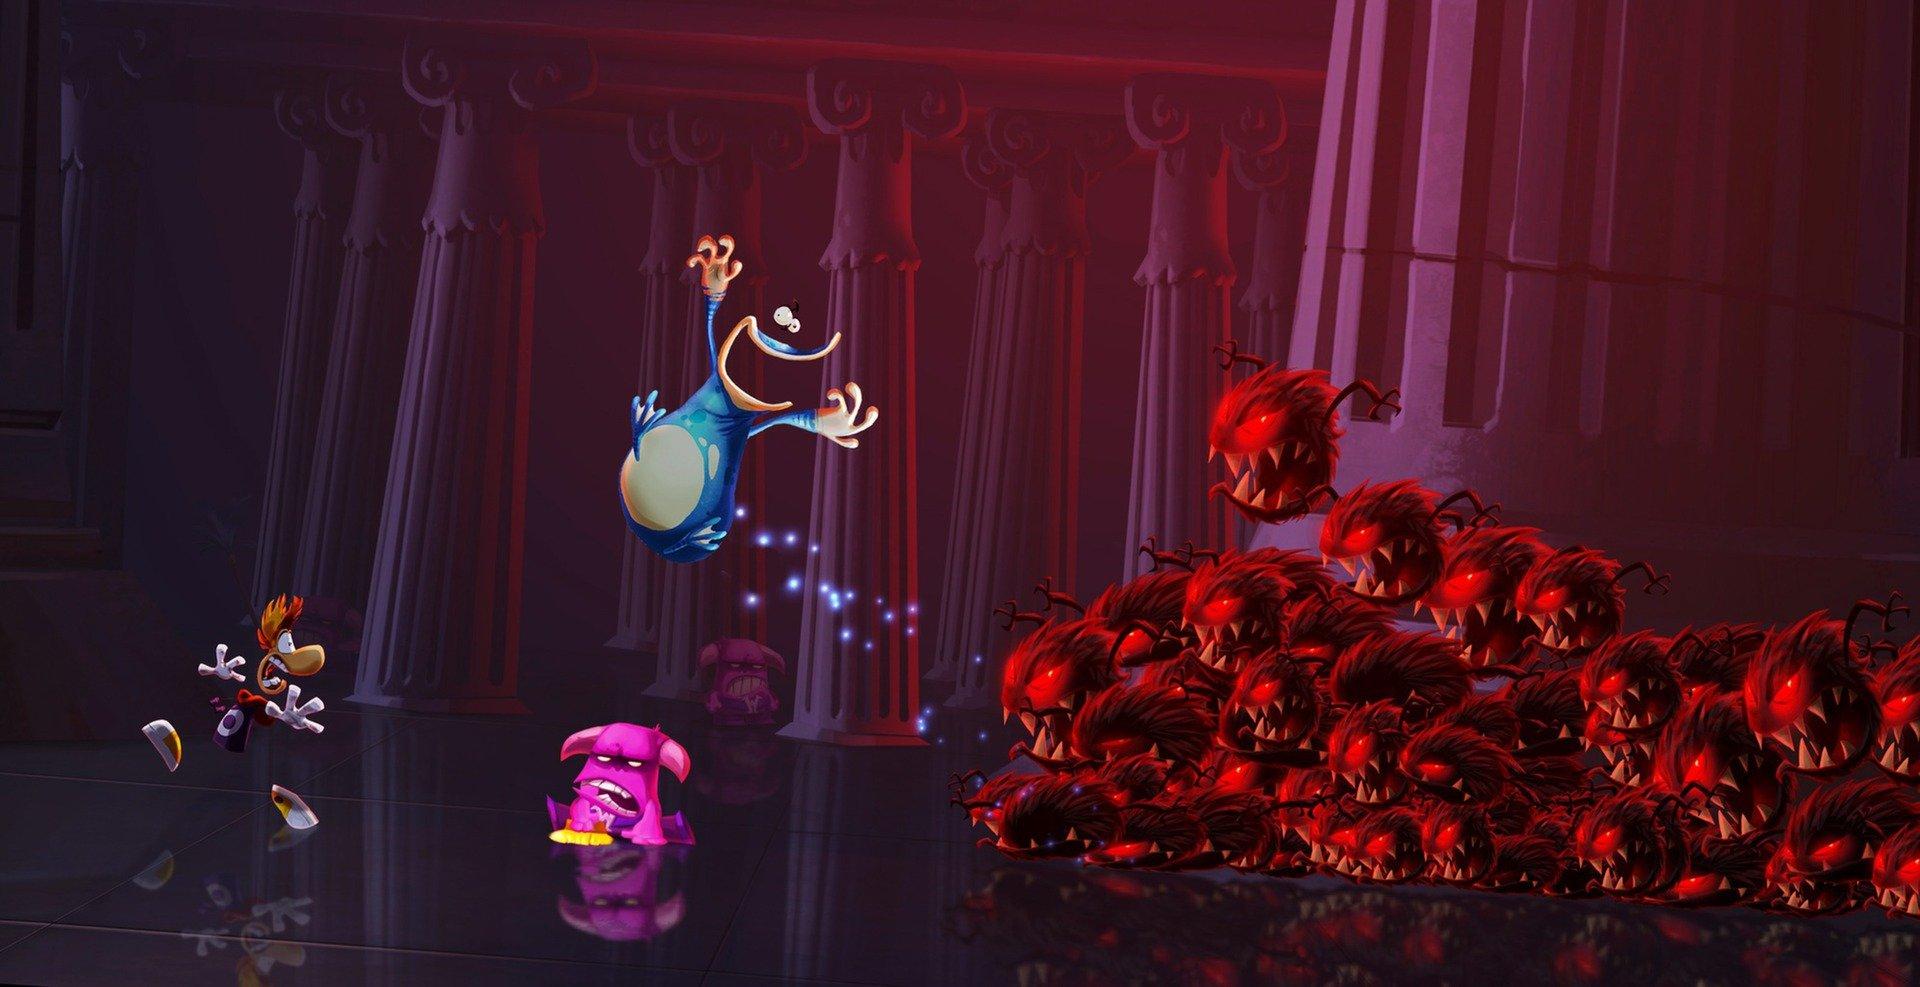 Rayman Legends - скидка 50% в стиме #пкгейминг - Изображение 1